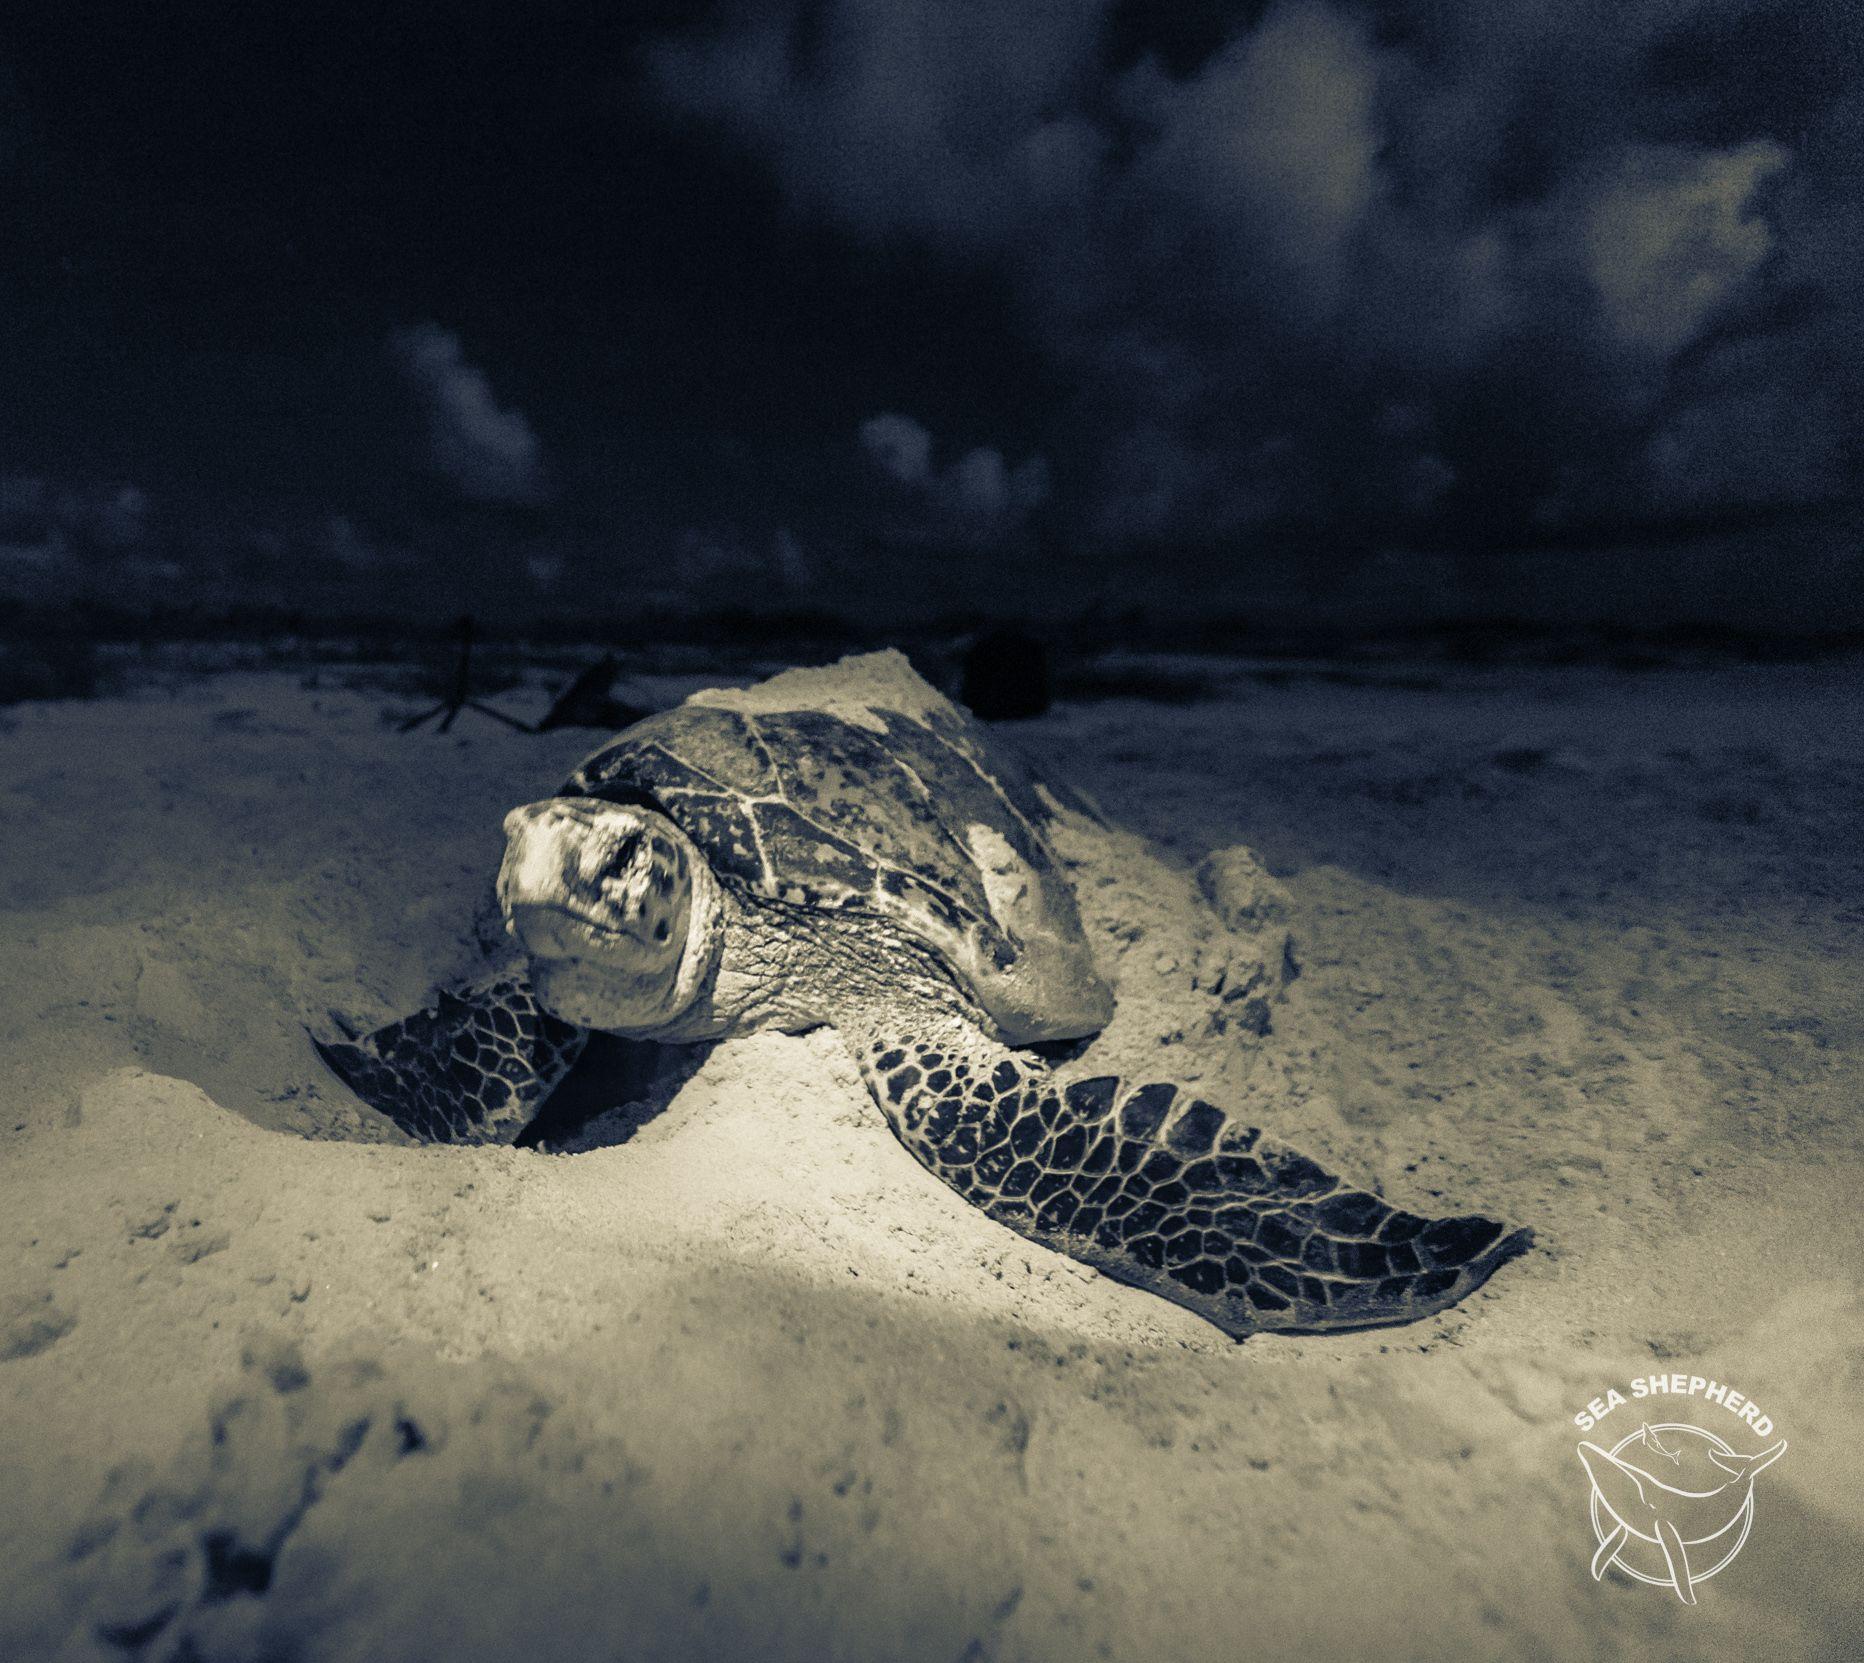 Hawksbill Turtle laying eggs #turtles #beach #seashepherd #marinelife